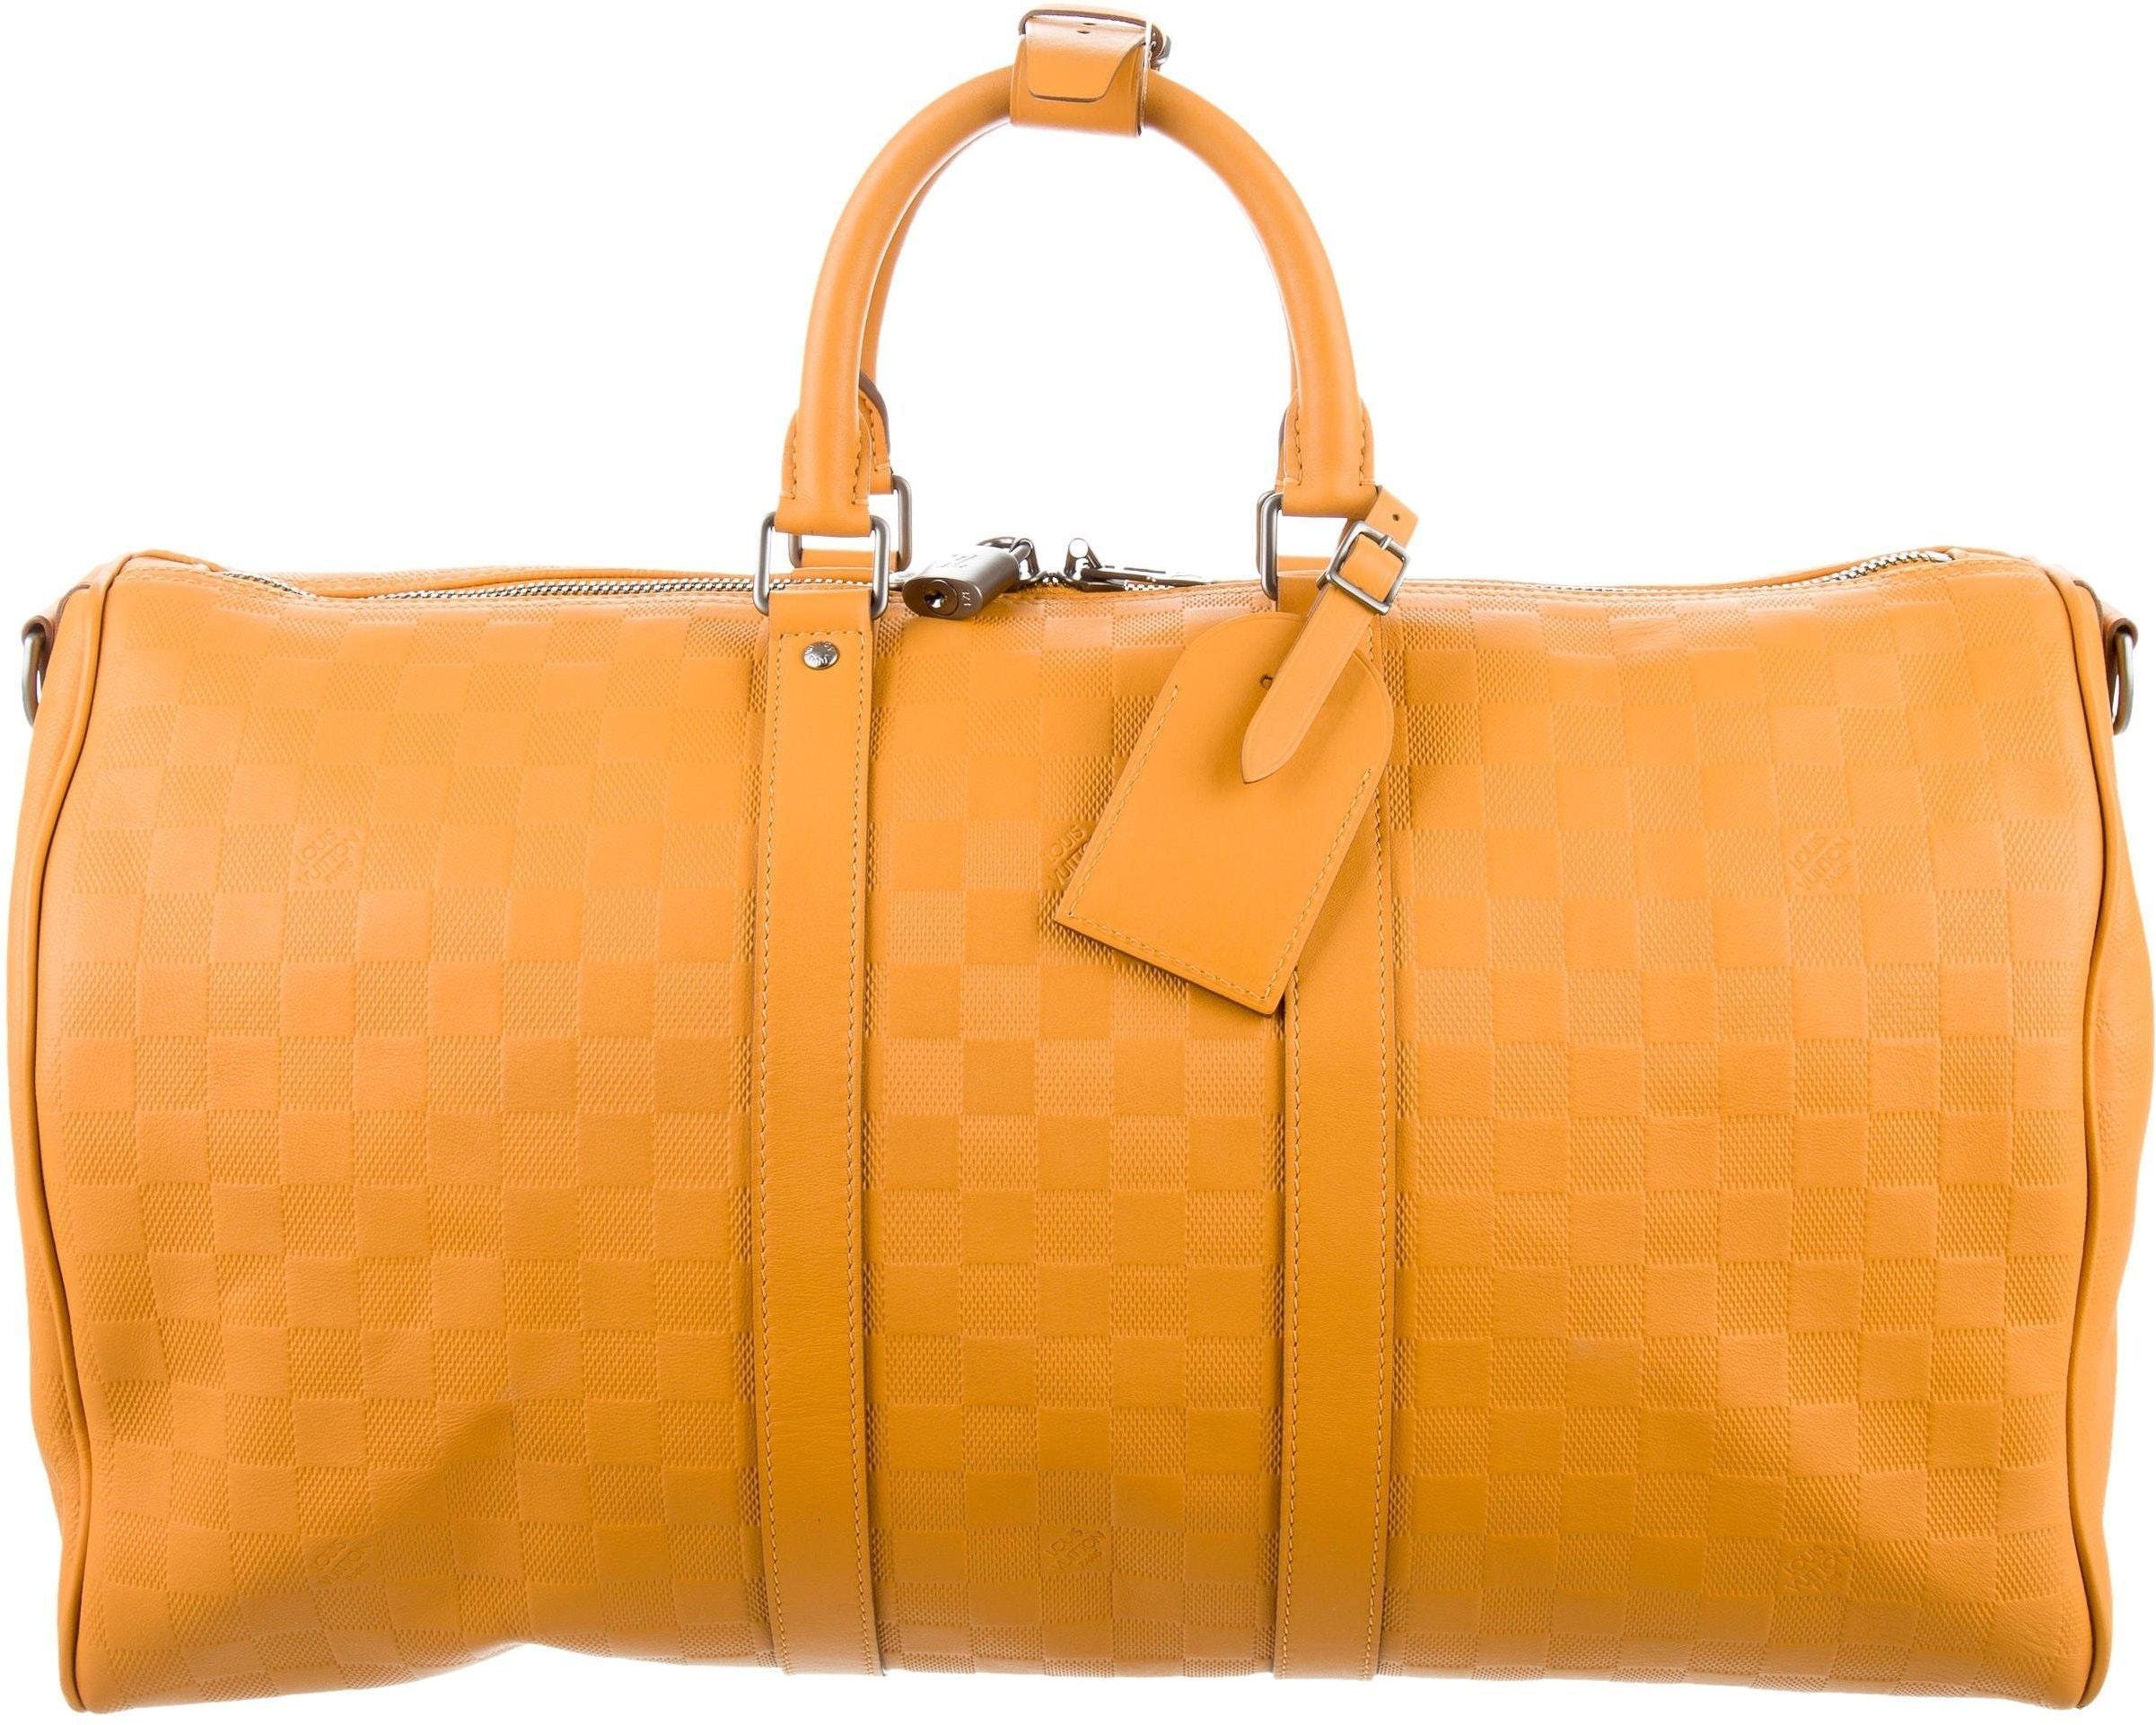 Louis Vuitton Duffle Keepall Bandouliere Damier Infini Embossed 45 Yellow